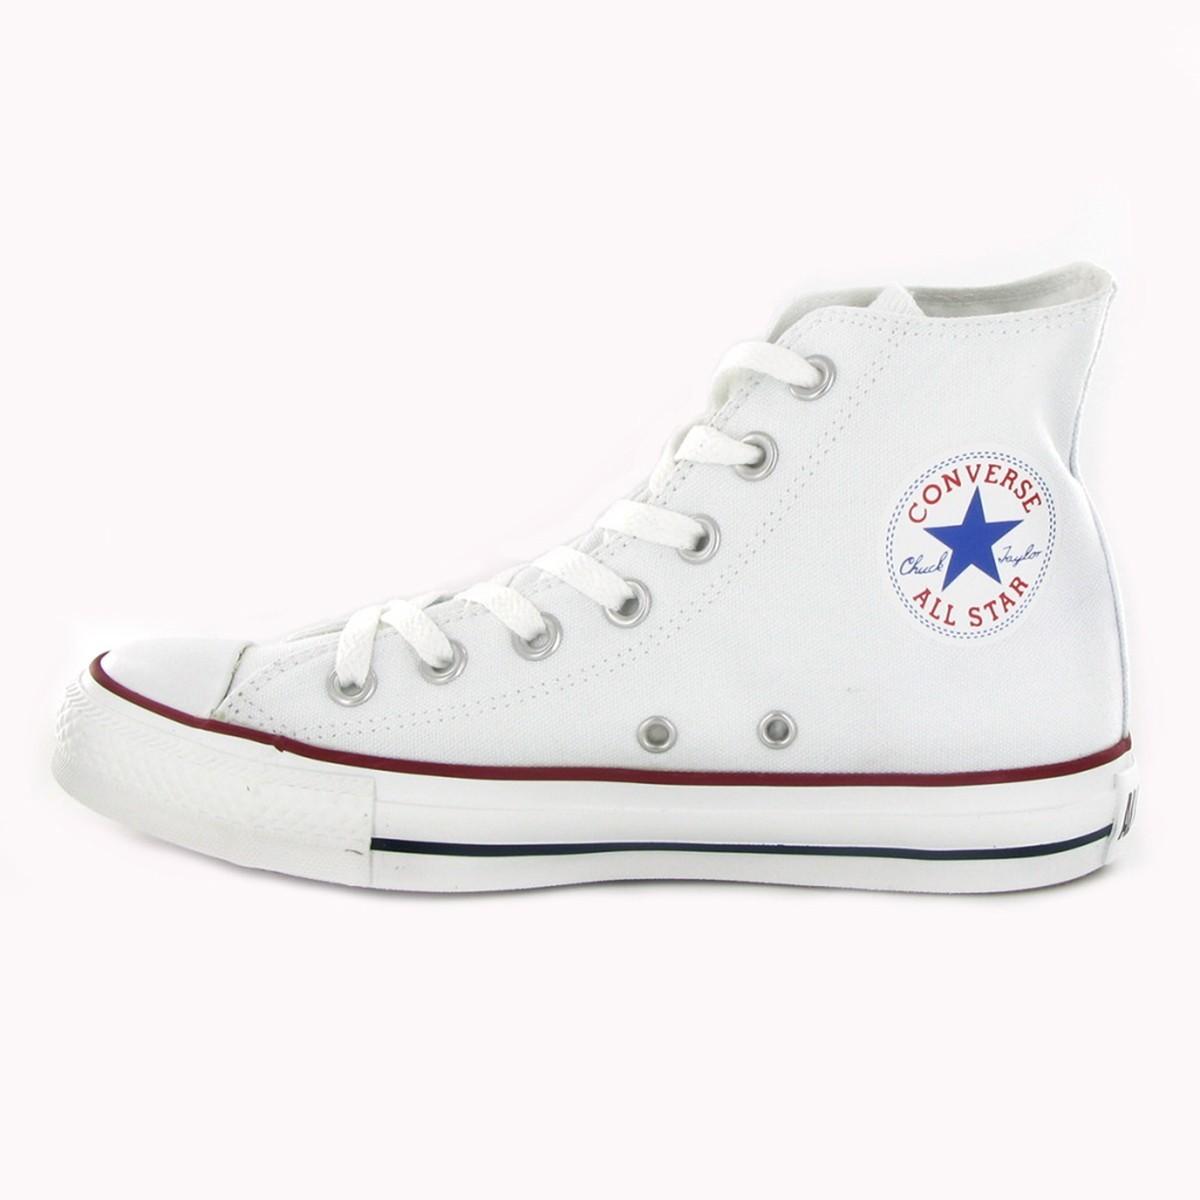 converse all star blancas mujer lona